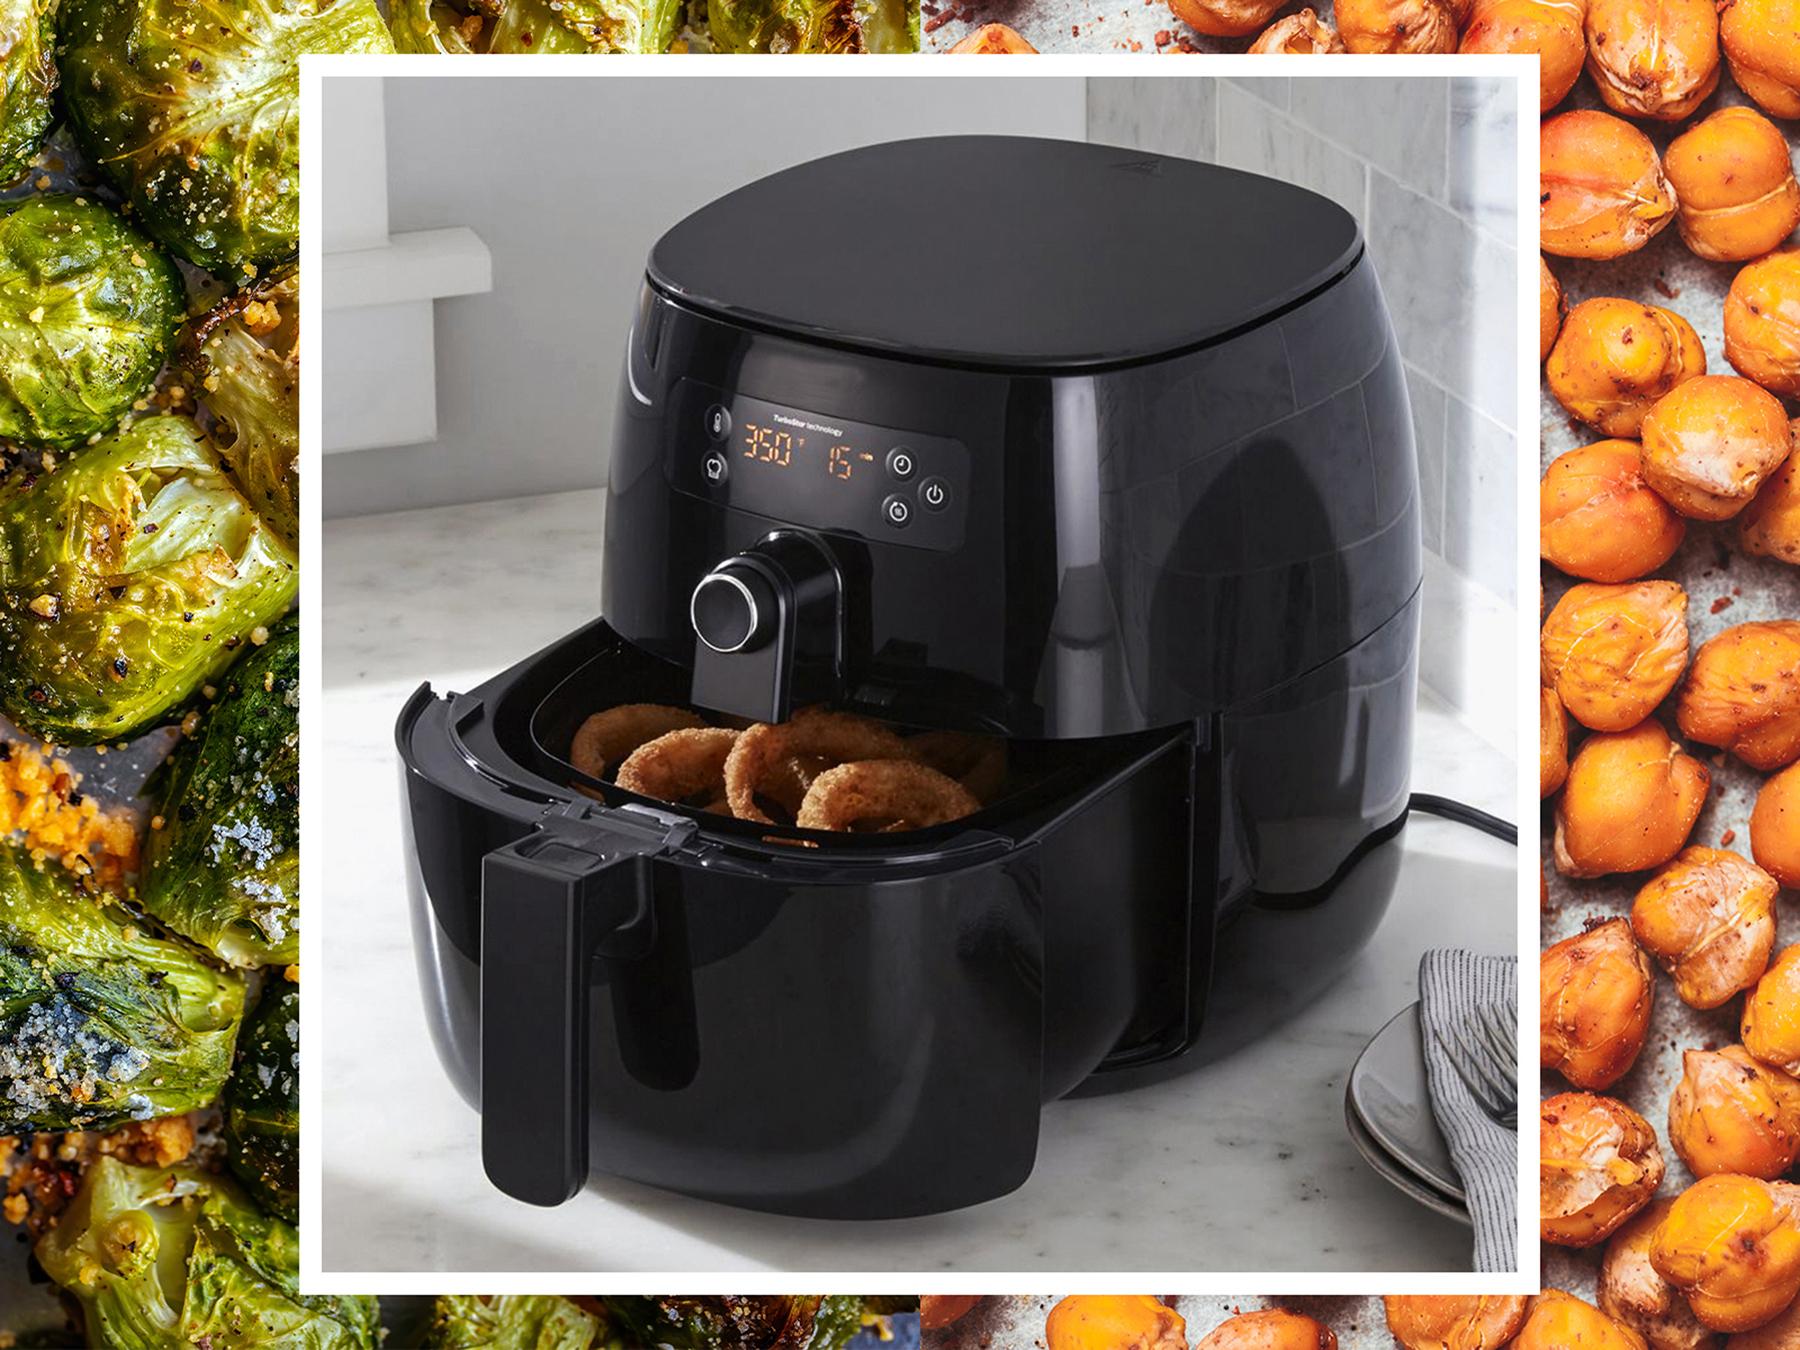 air-fryer-guide-recipes-kr-2x1-tease-200706_4ddebd497ba308a7b82c99236be591cf